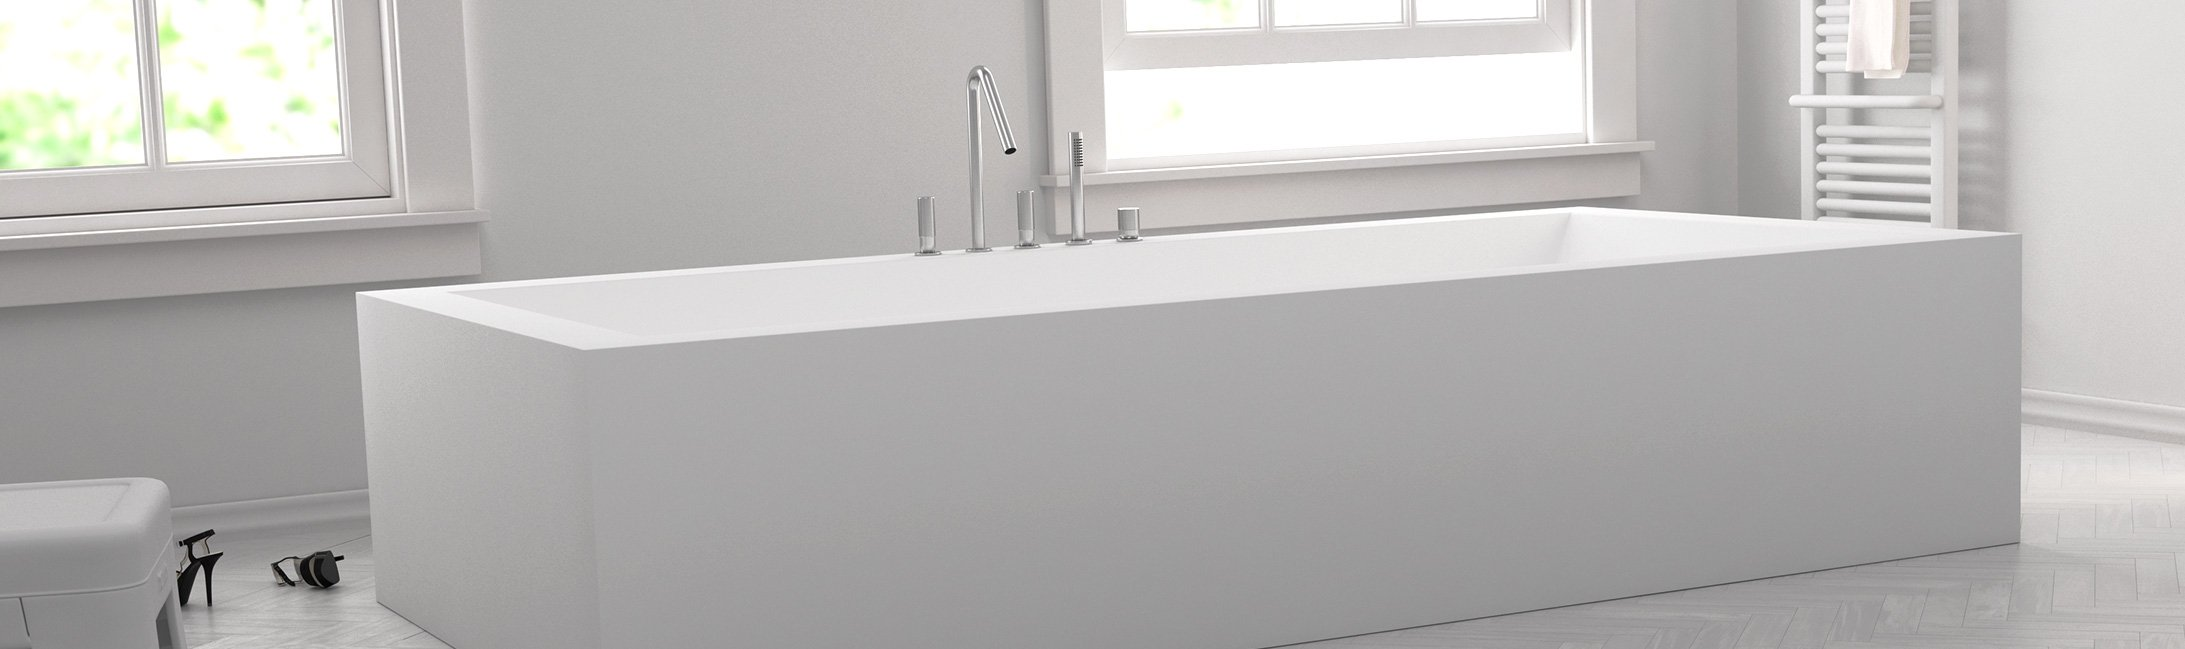 baignoire design ilot trendy baignoire ilot petite taille. Black Bedroom Furniture Sets. Home Design Ideas